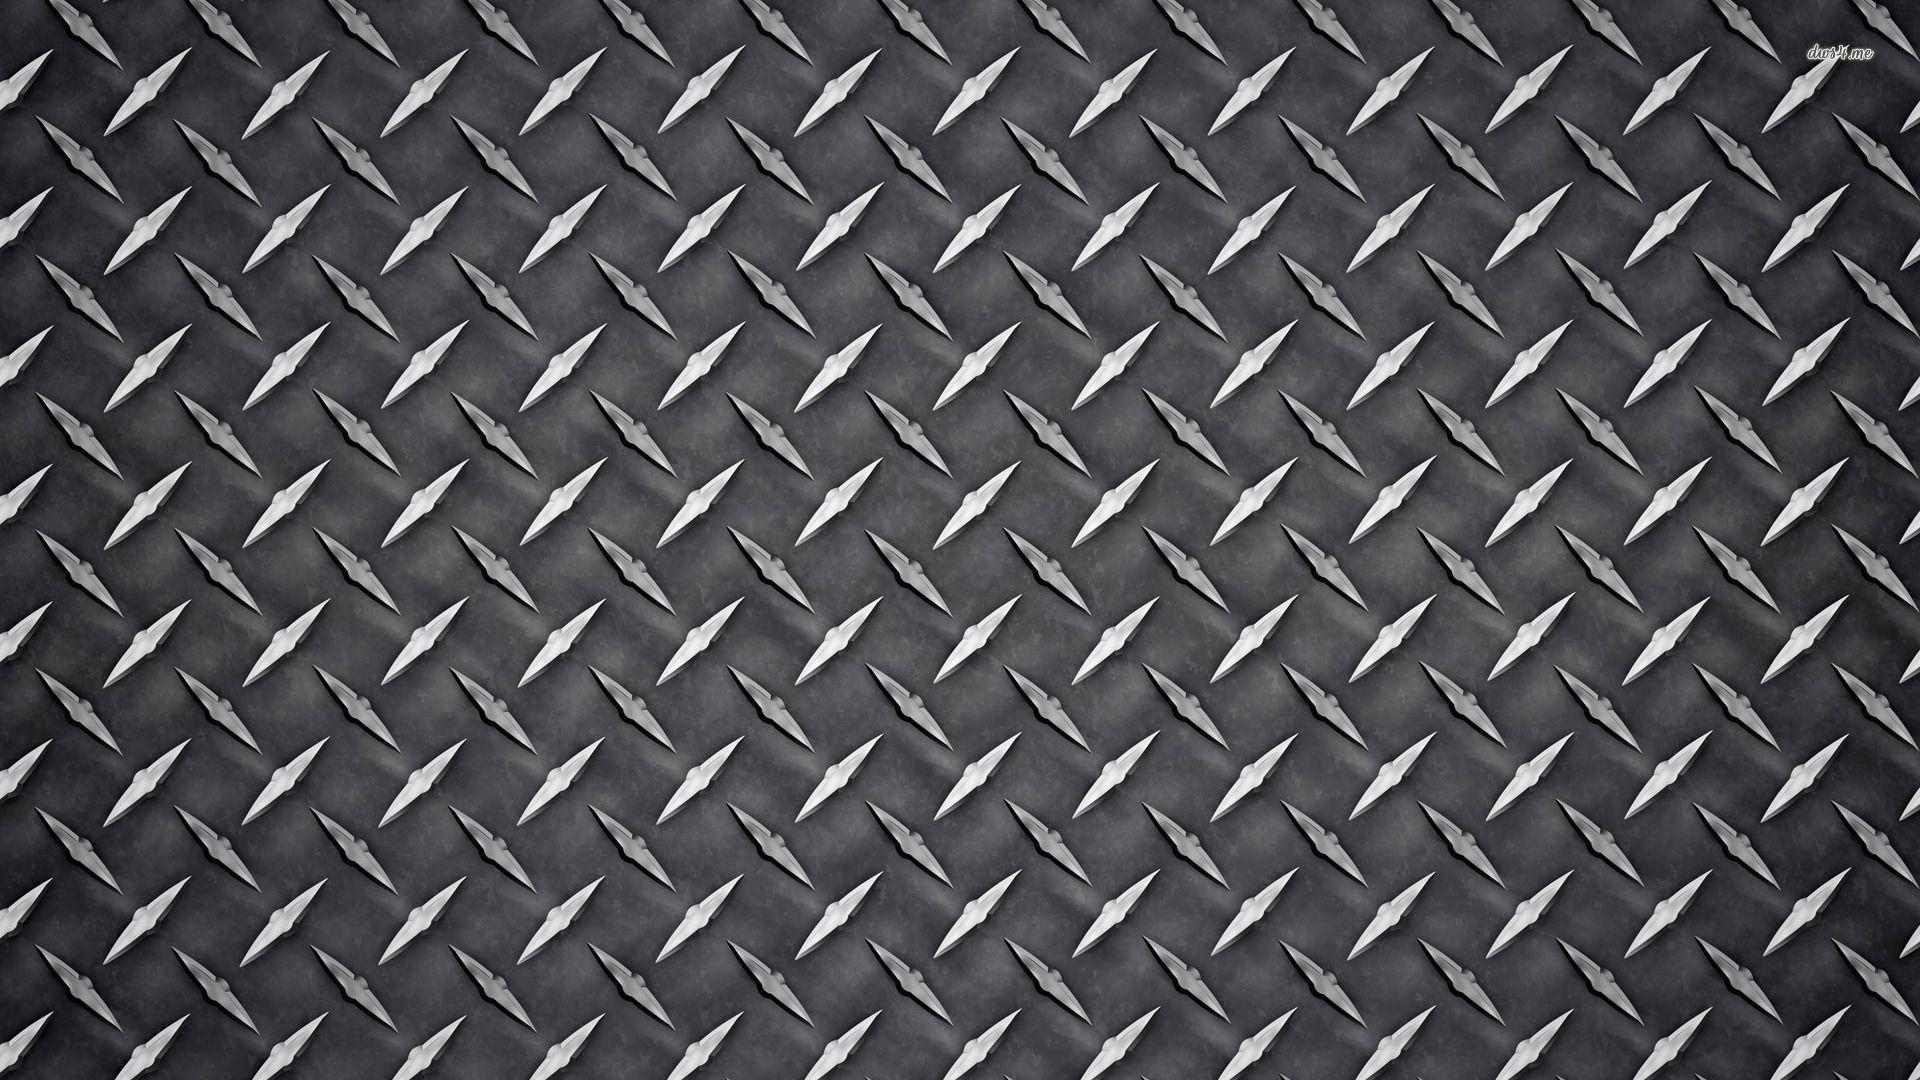 Stainless Steel new wallpaper